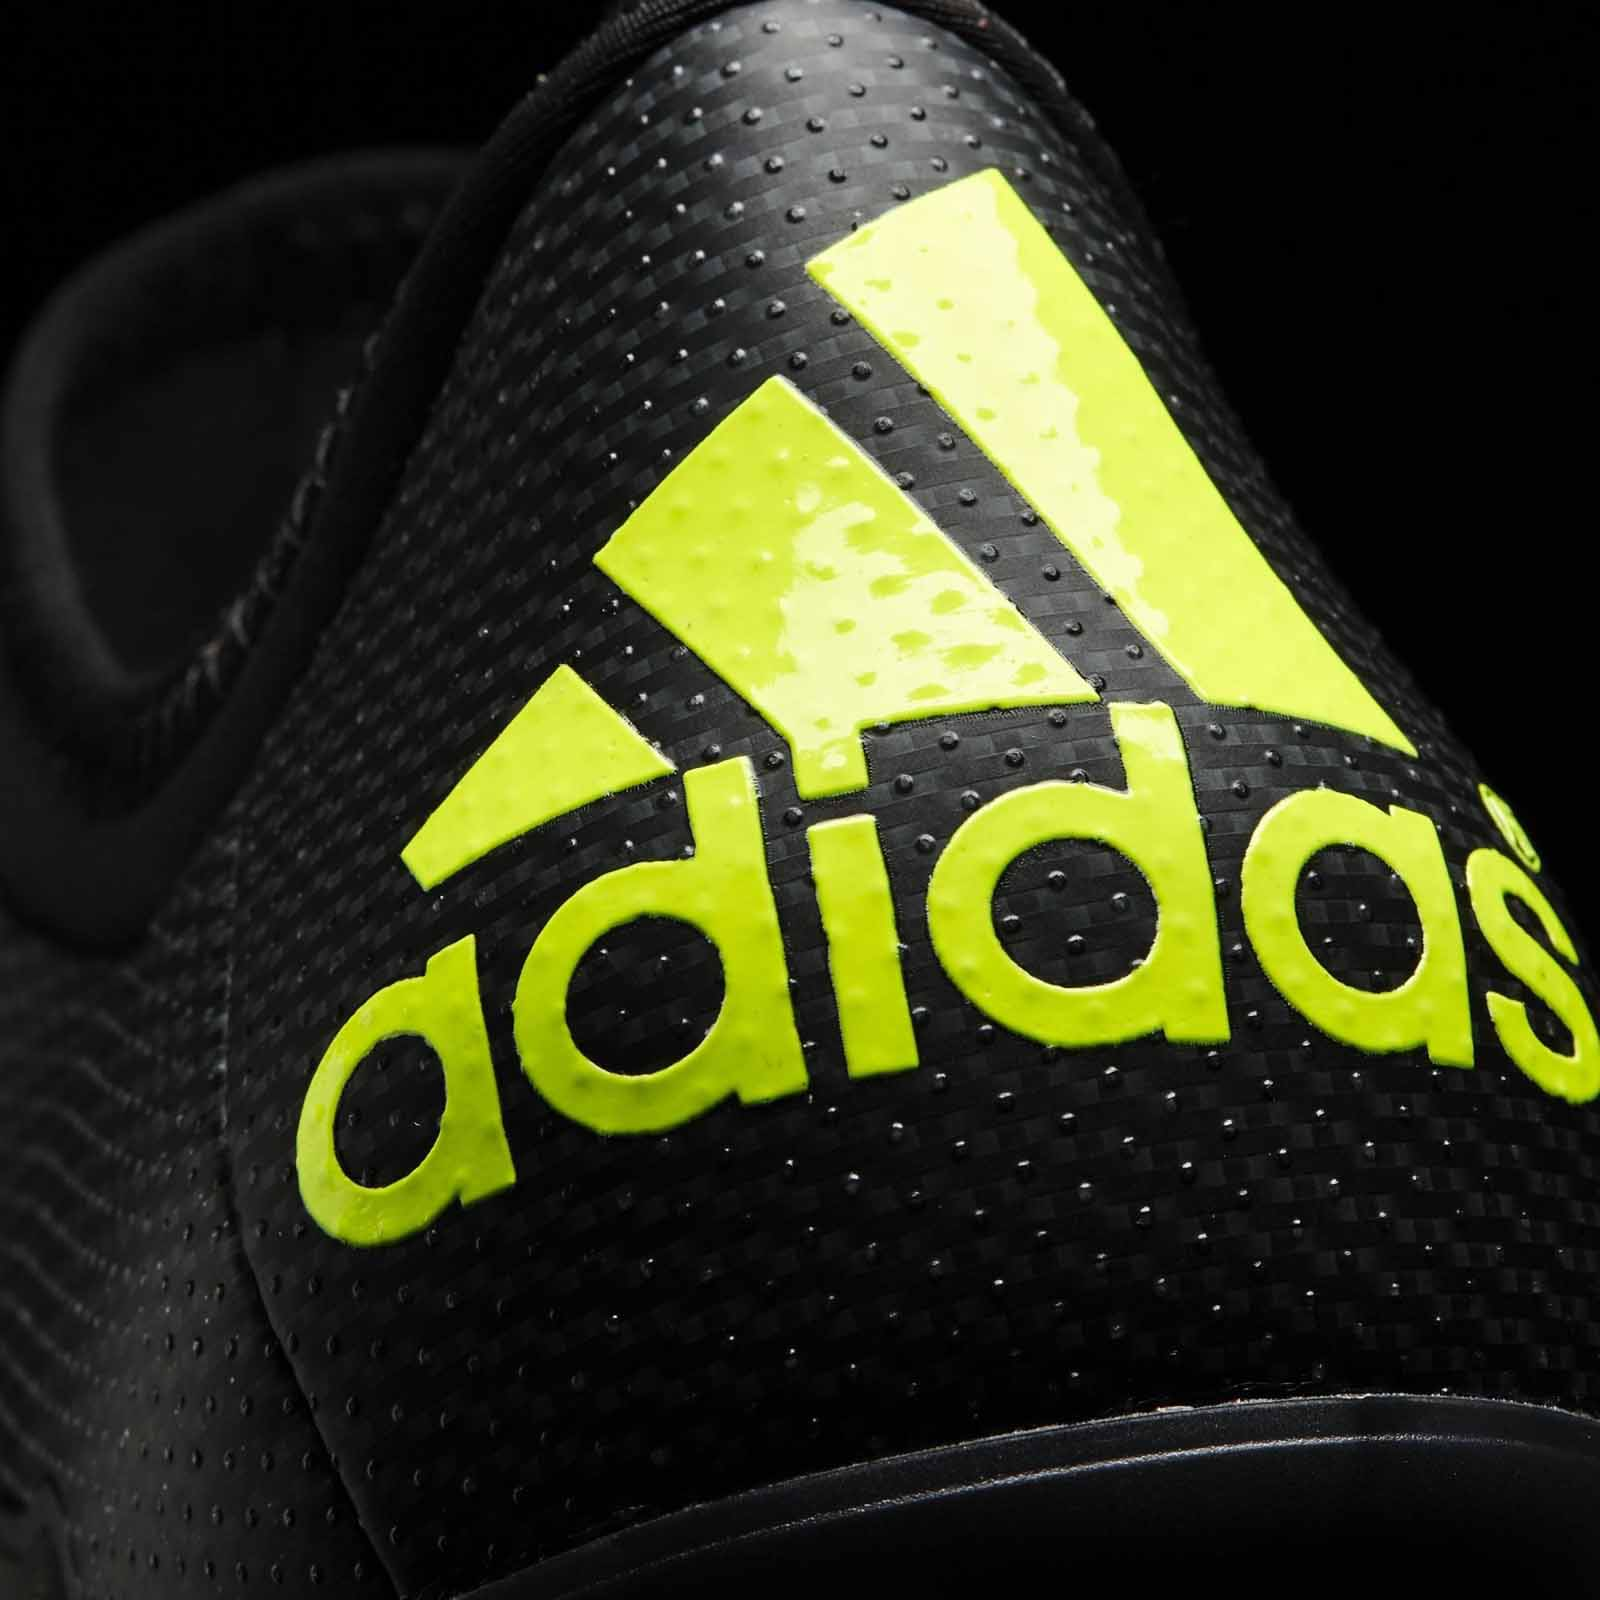 Adidas Shoes 2016 Football